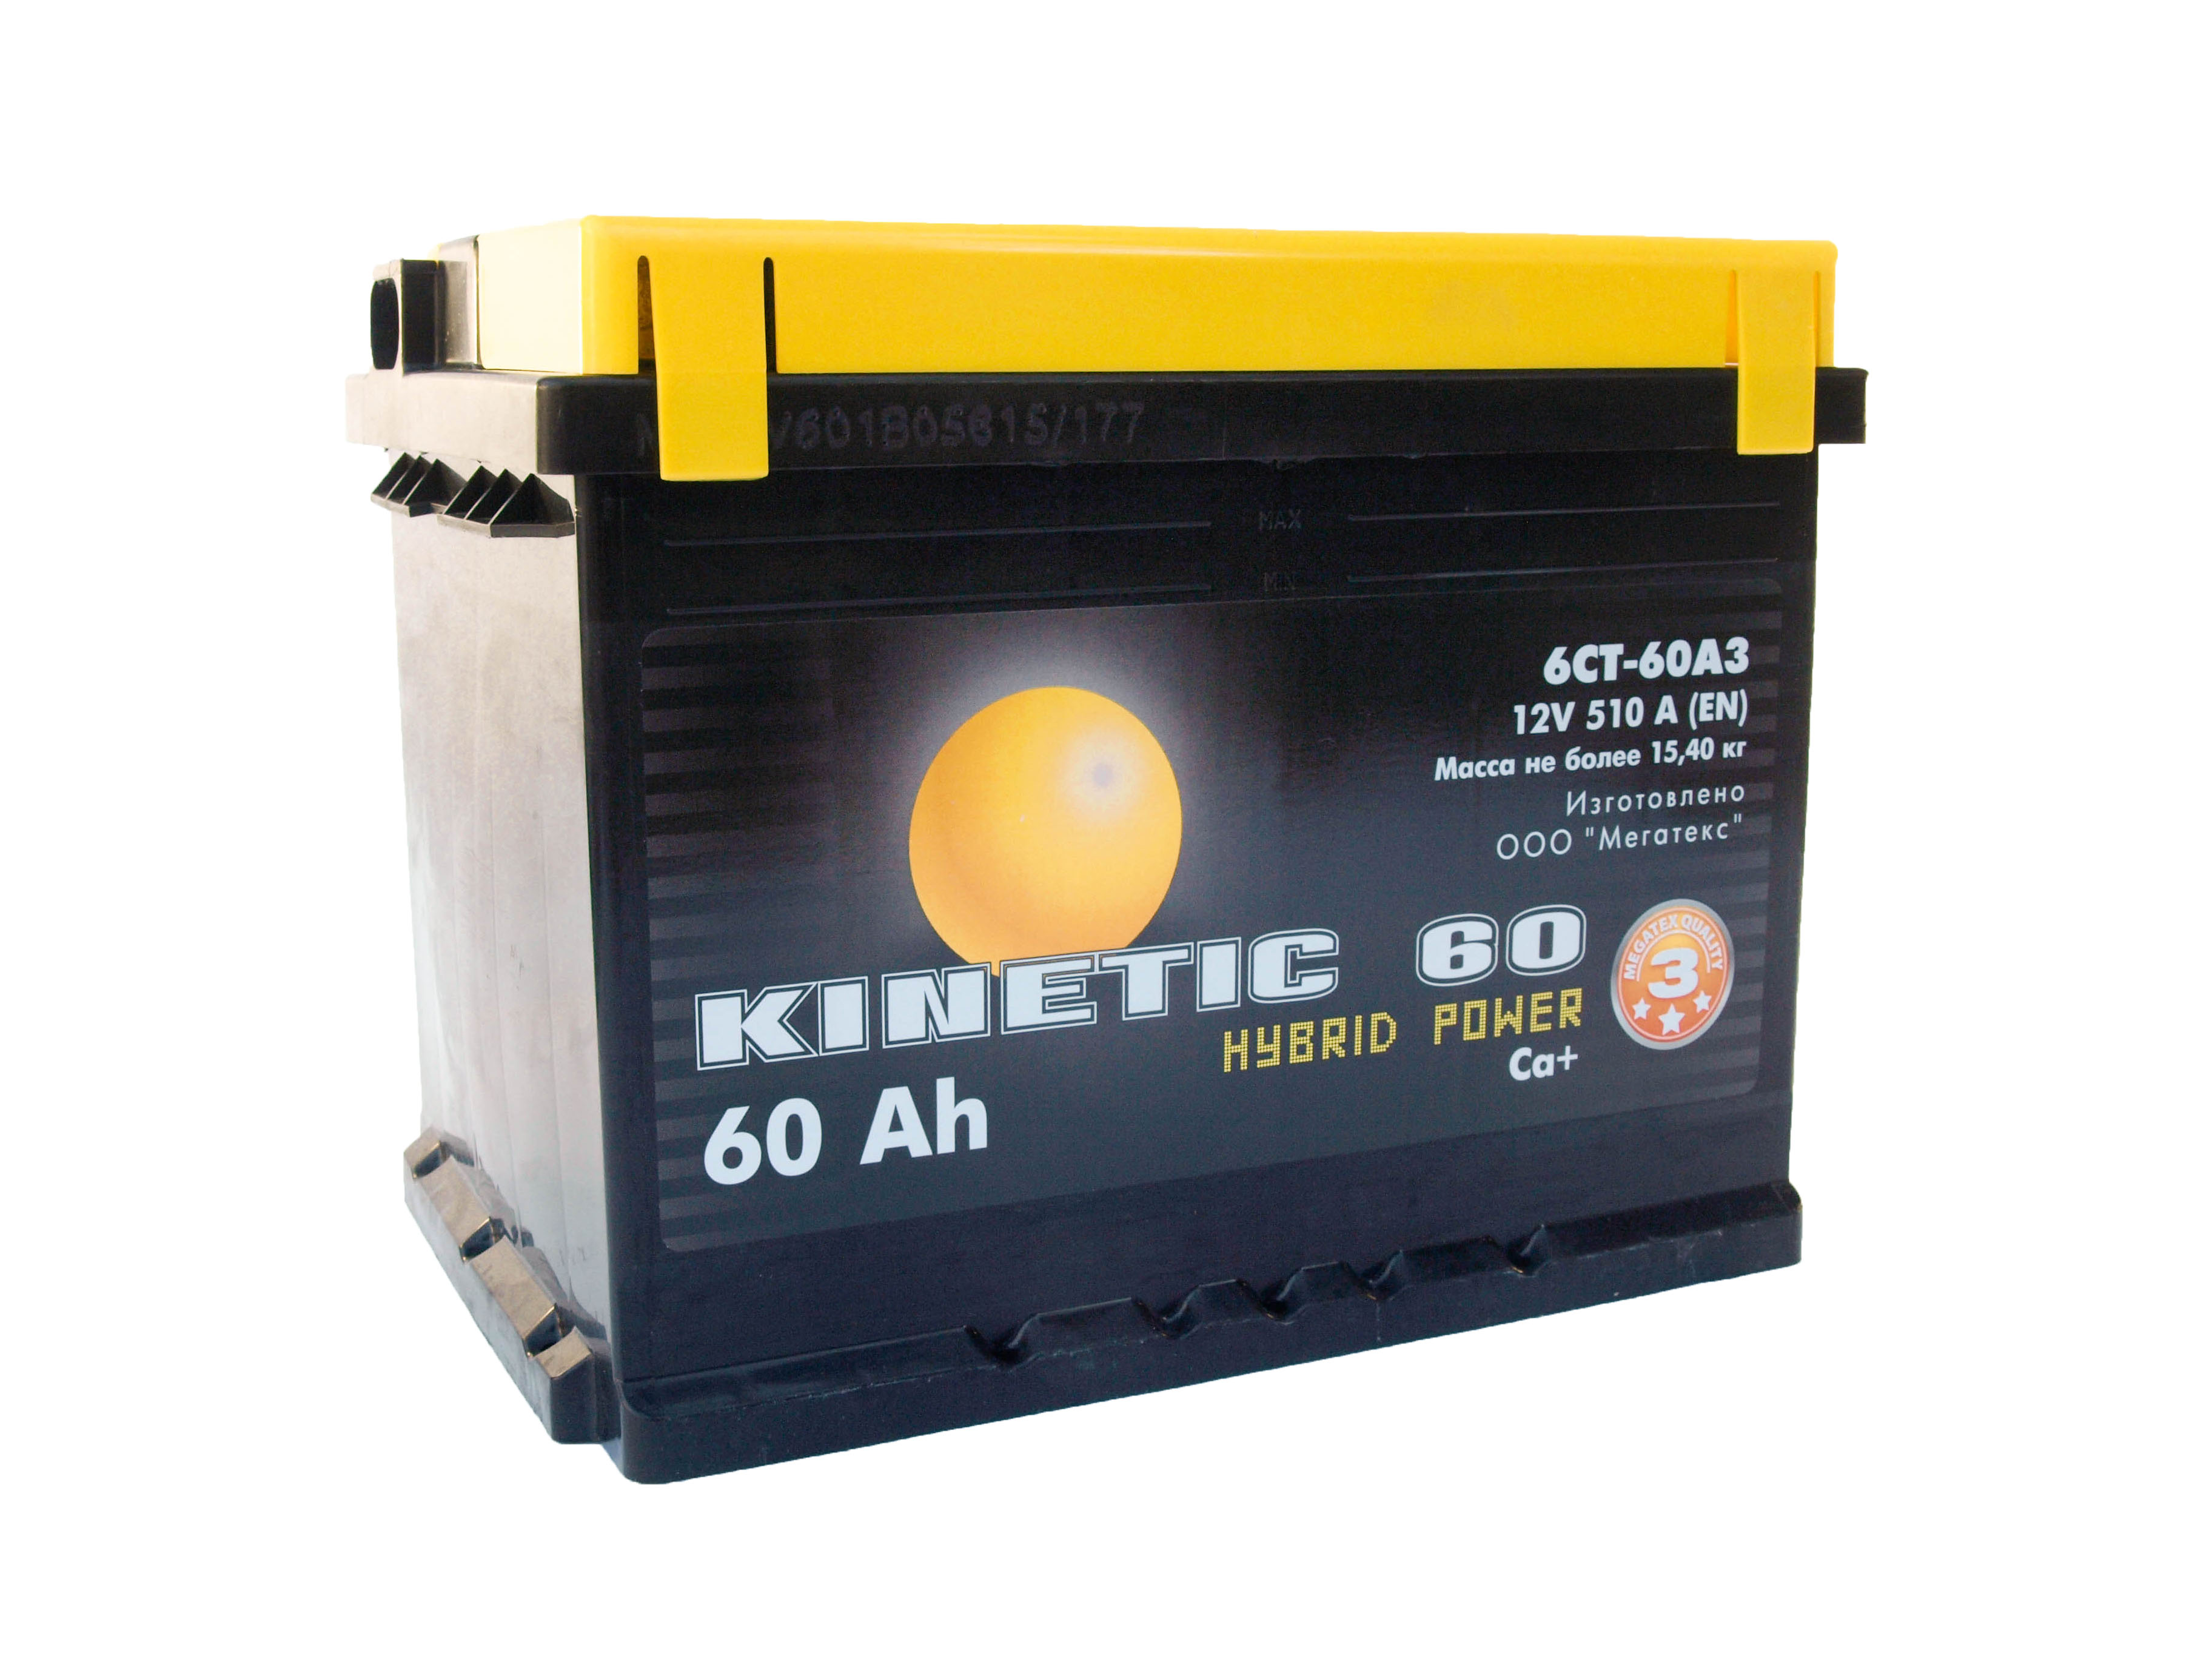 Купить Аккамулятор Kinetic Hybrid 60 Ah (1) 510 A